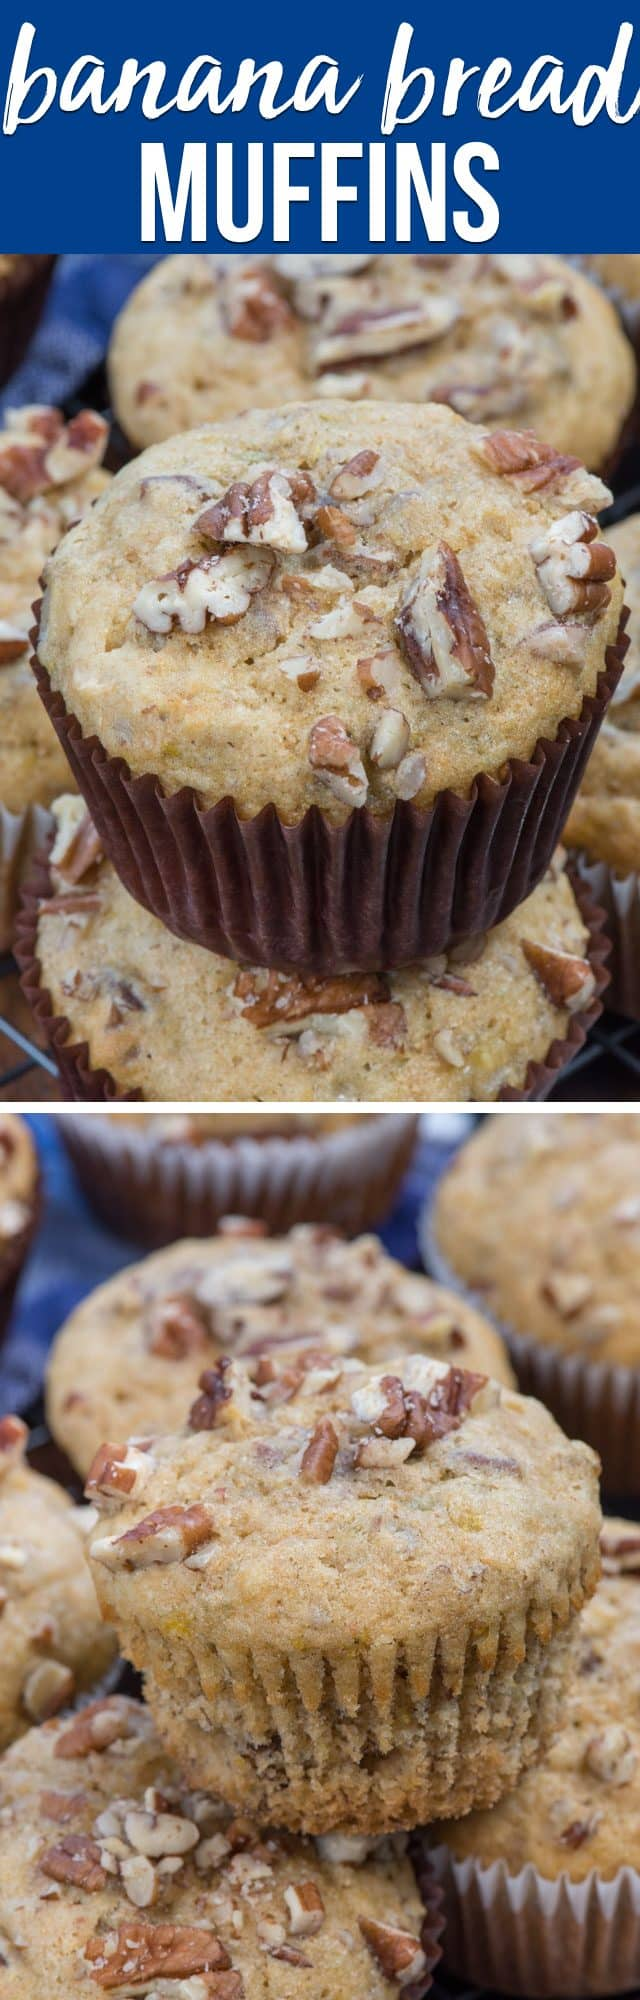 banana nut muffin collage